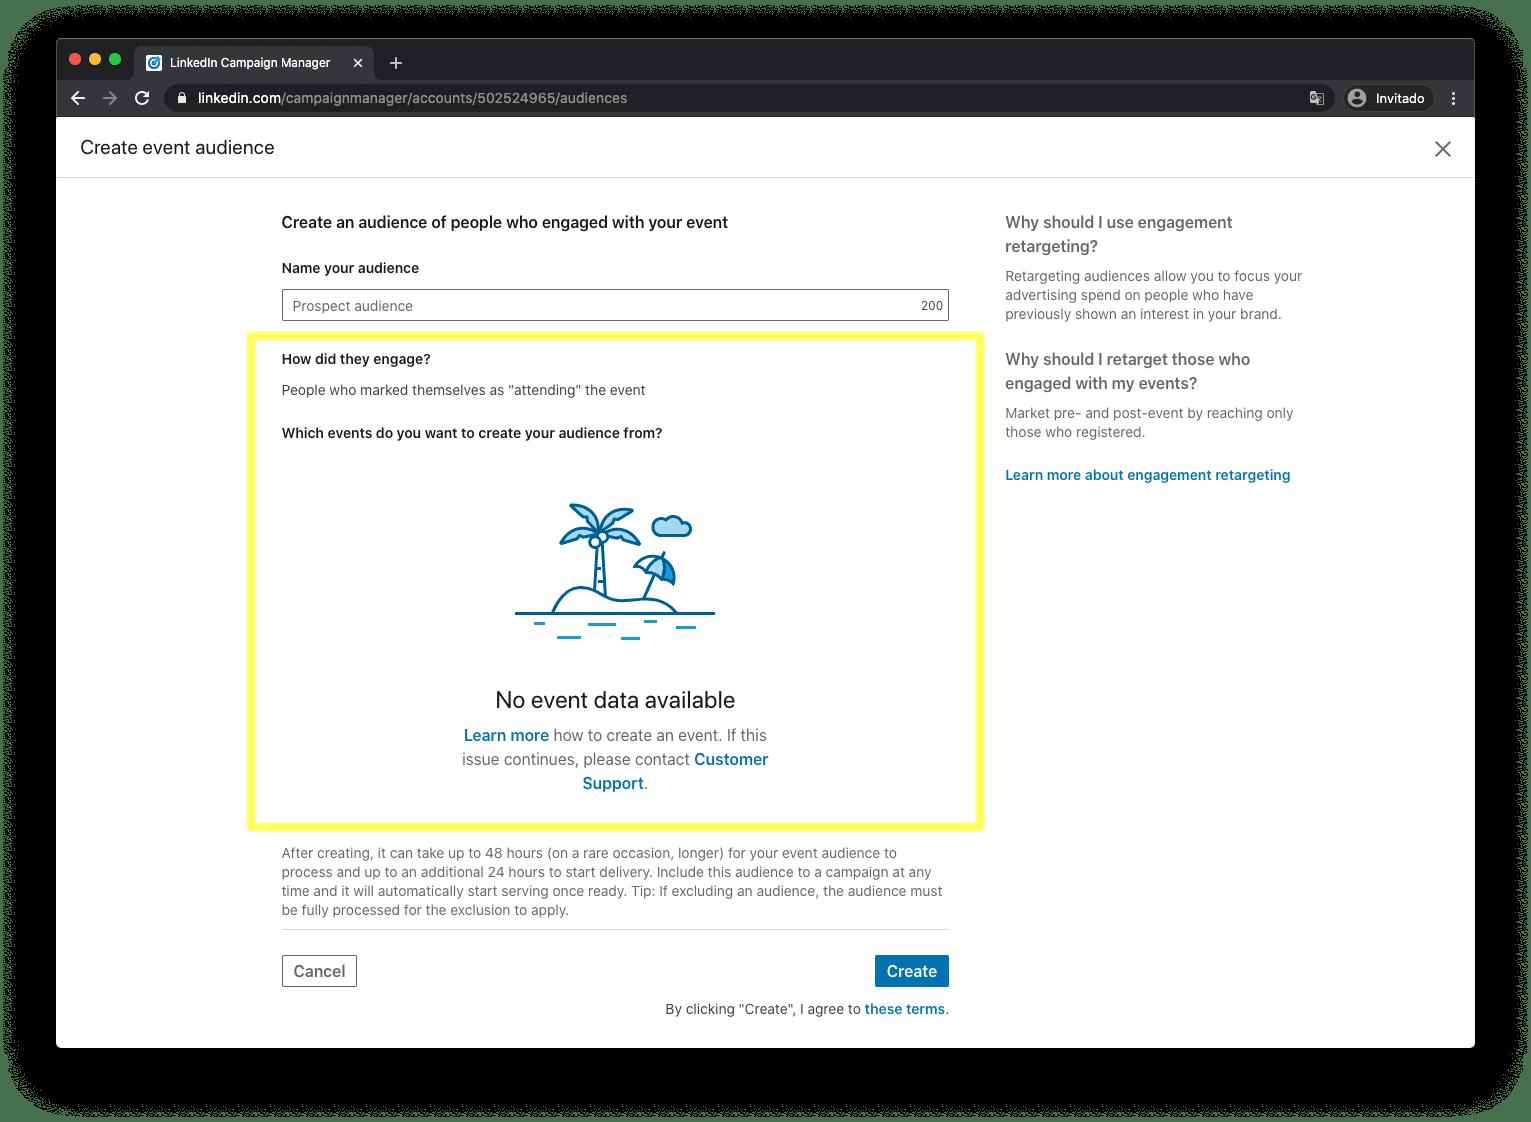 Event-based Retargeting on LinkedIn